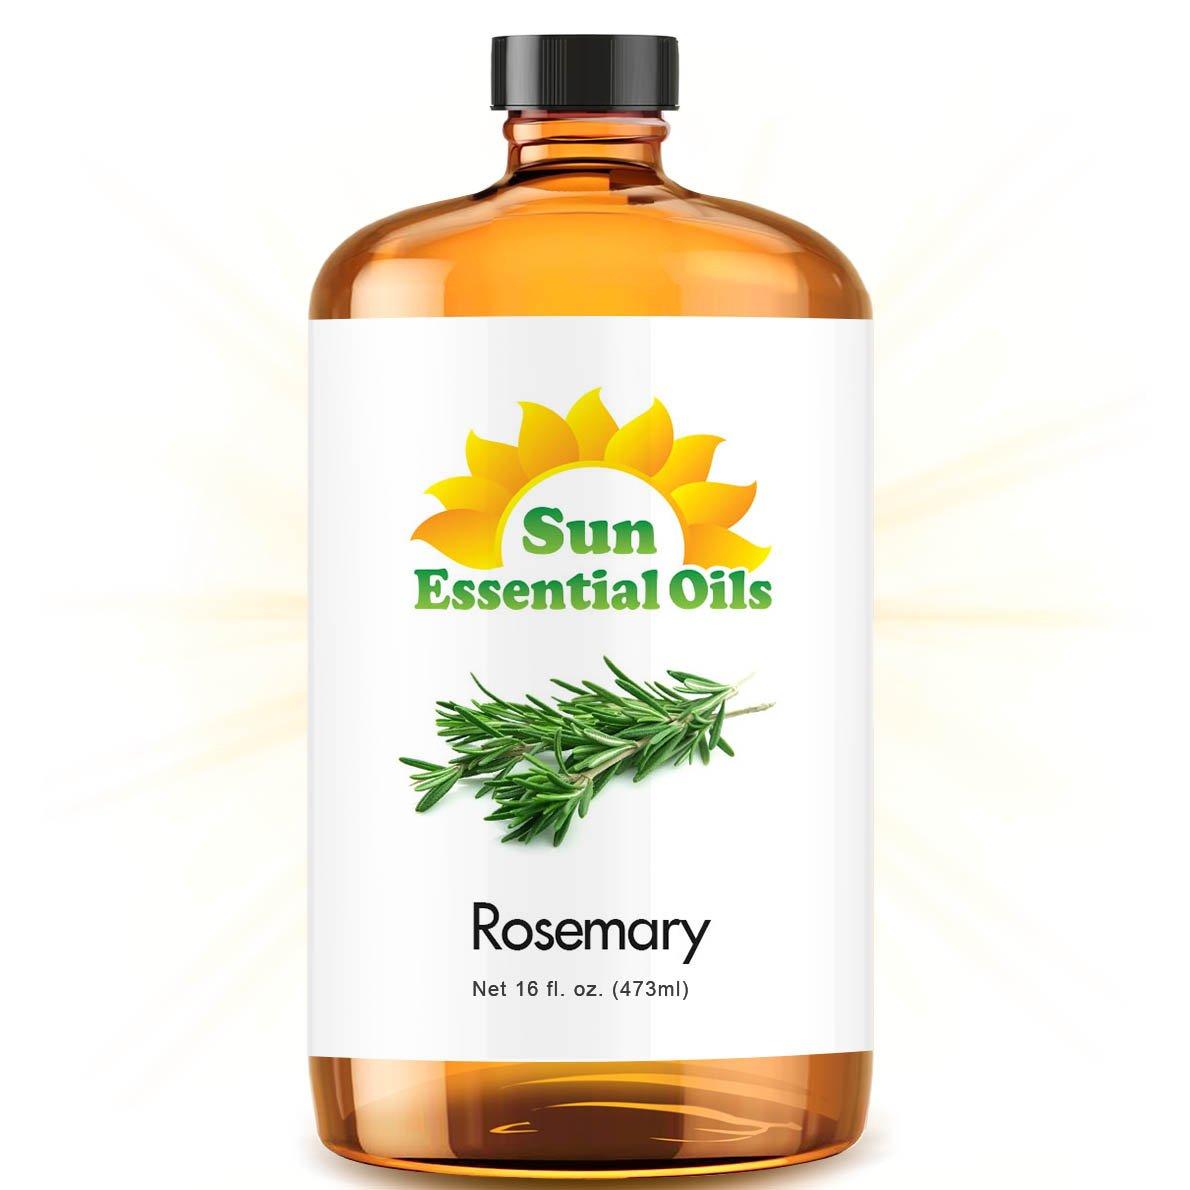 Bulk Rosemary Oil - Ultra 16 Ounce - 100% Pure Essential Oil (Best 16 fl oz / 472ml) - Sun Essential by Sun Essential Oils